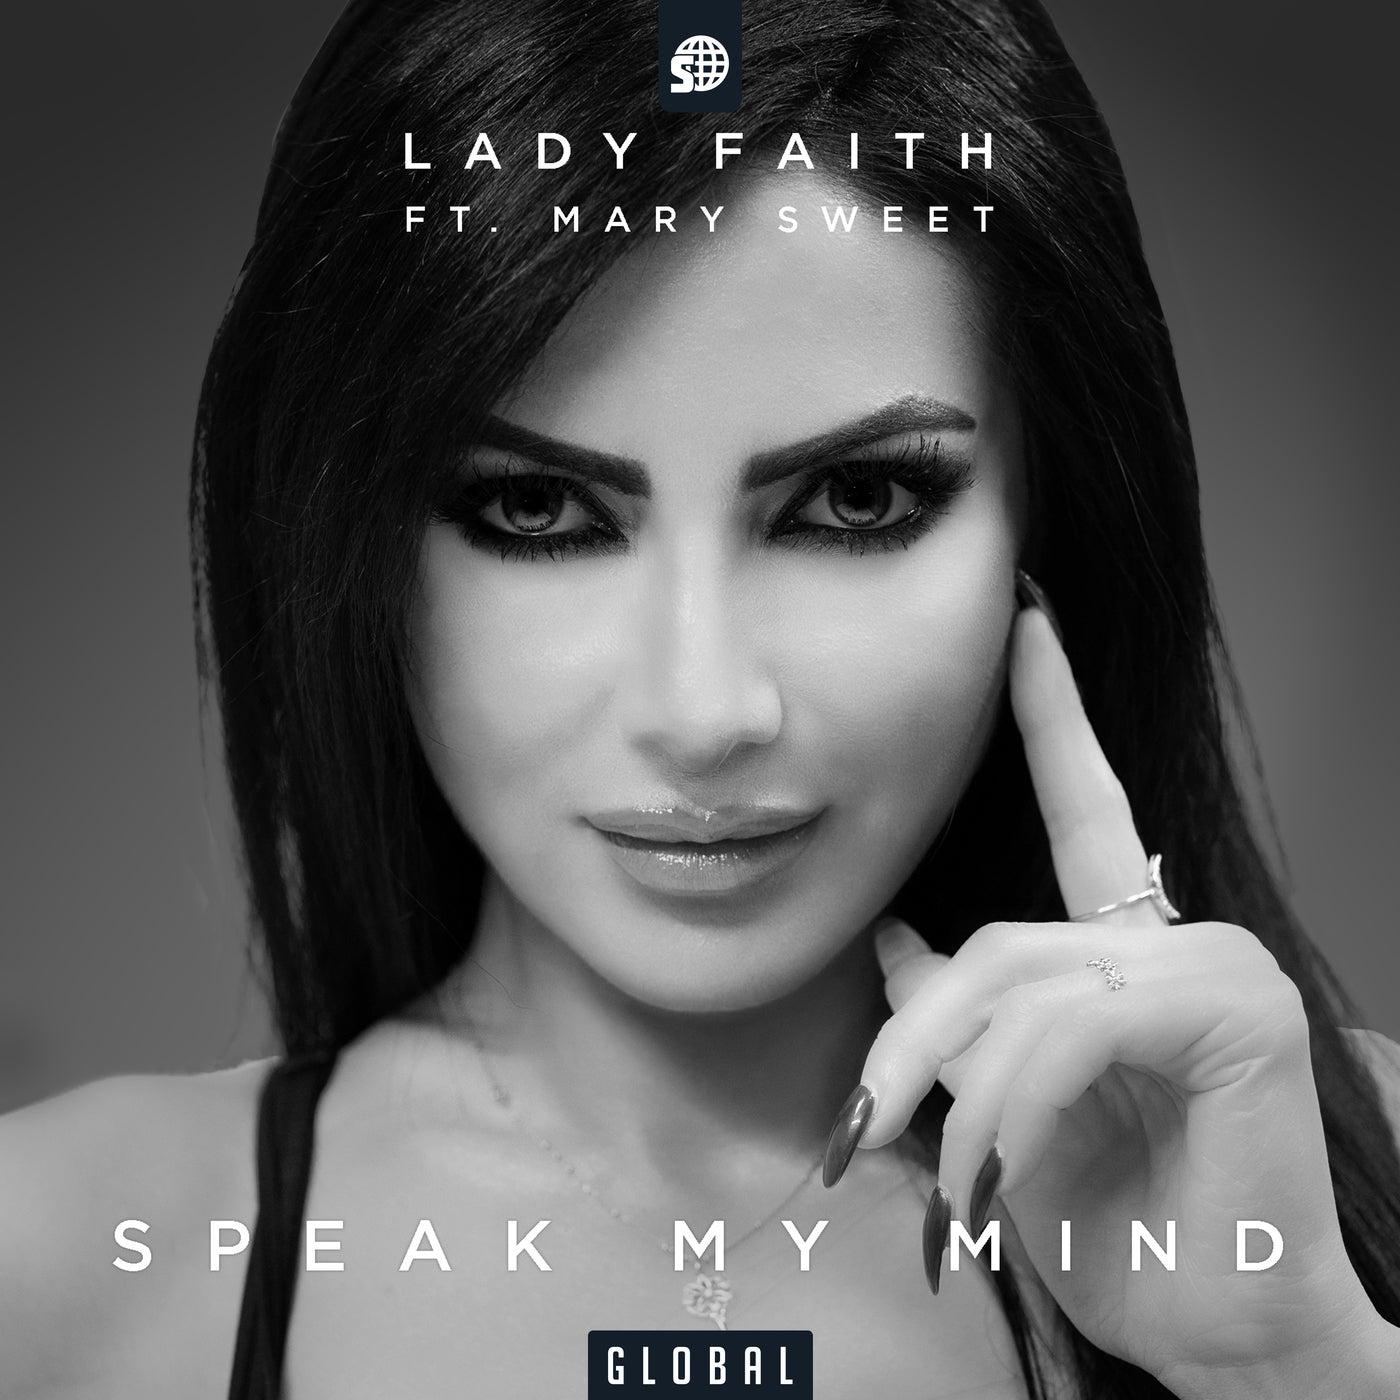 Speak My Mind feat. Mary Sweet (Original Mix)